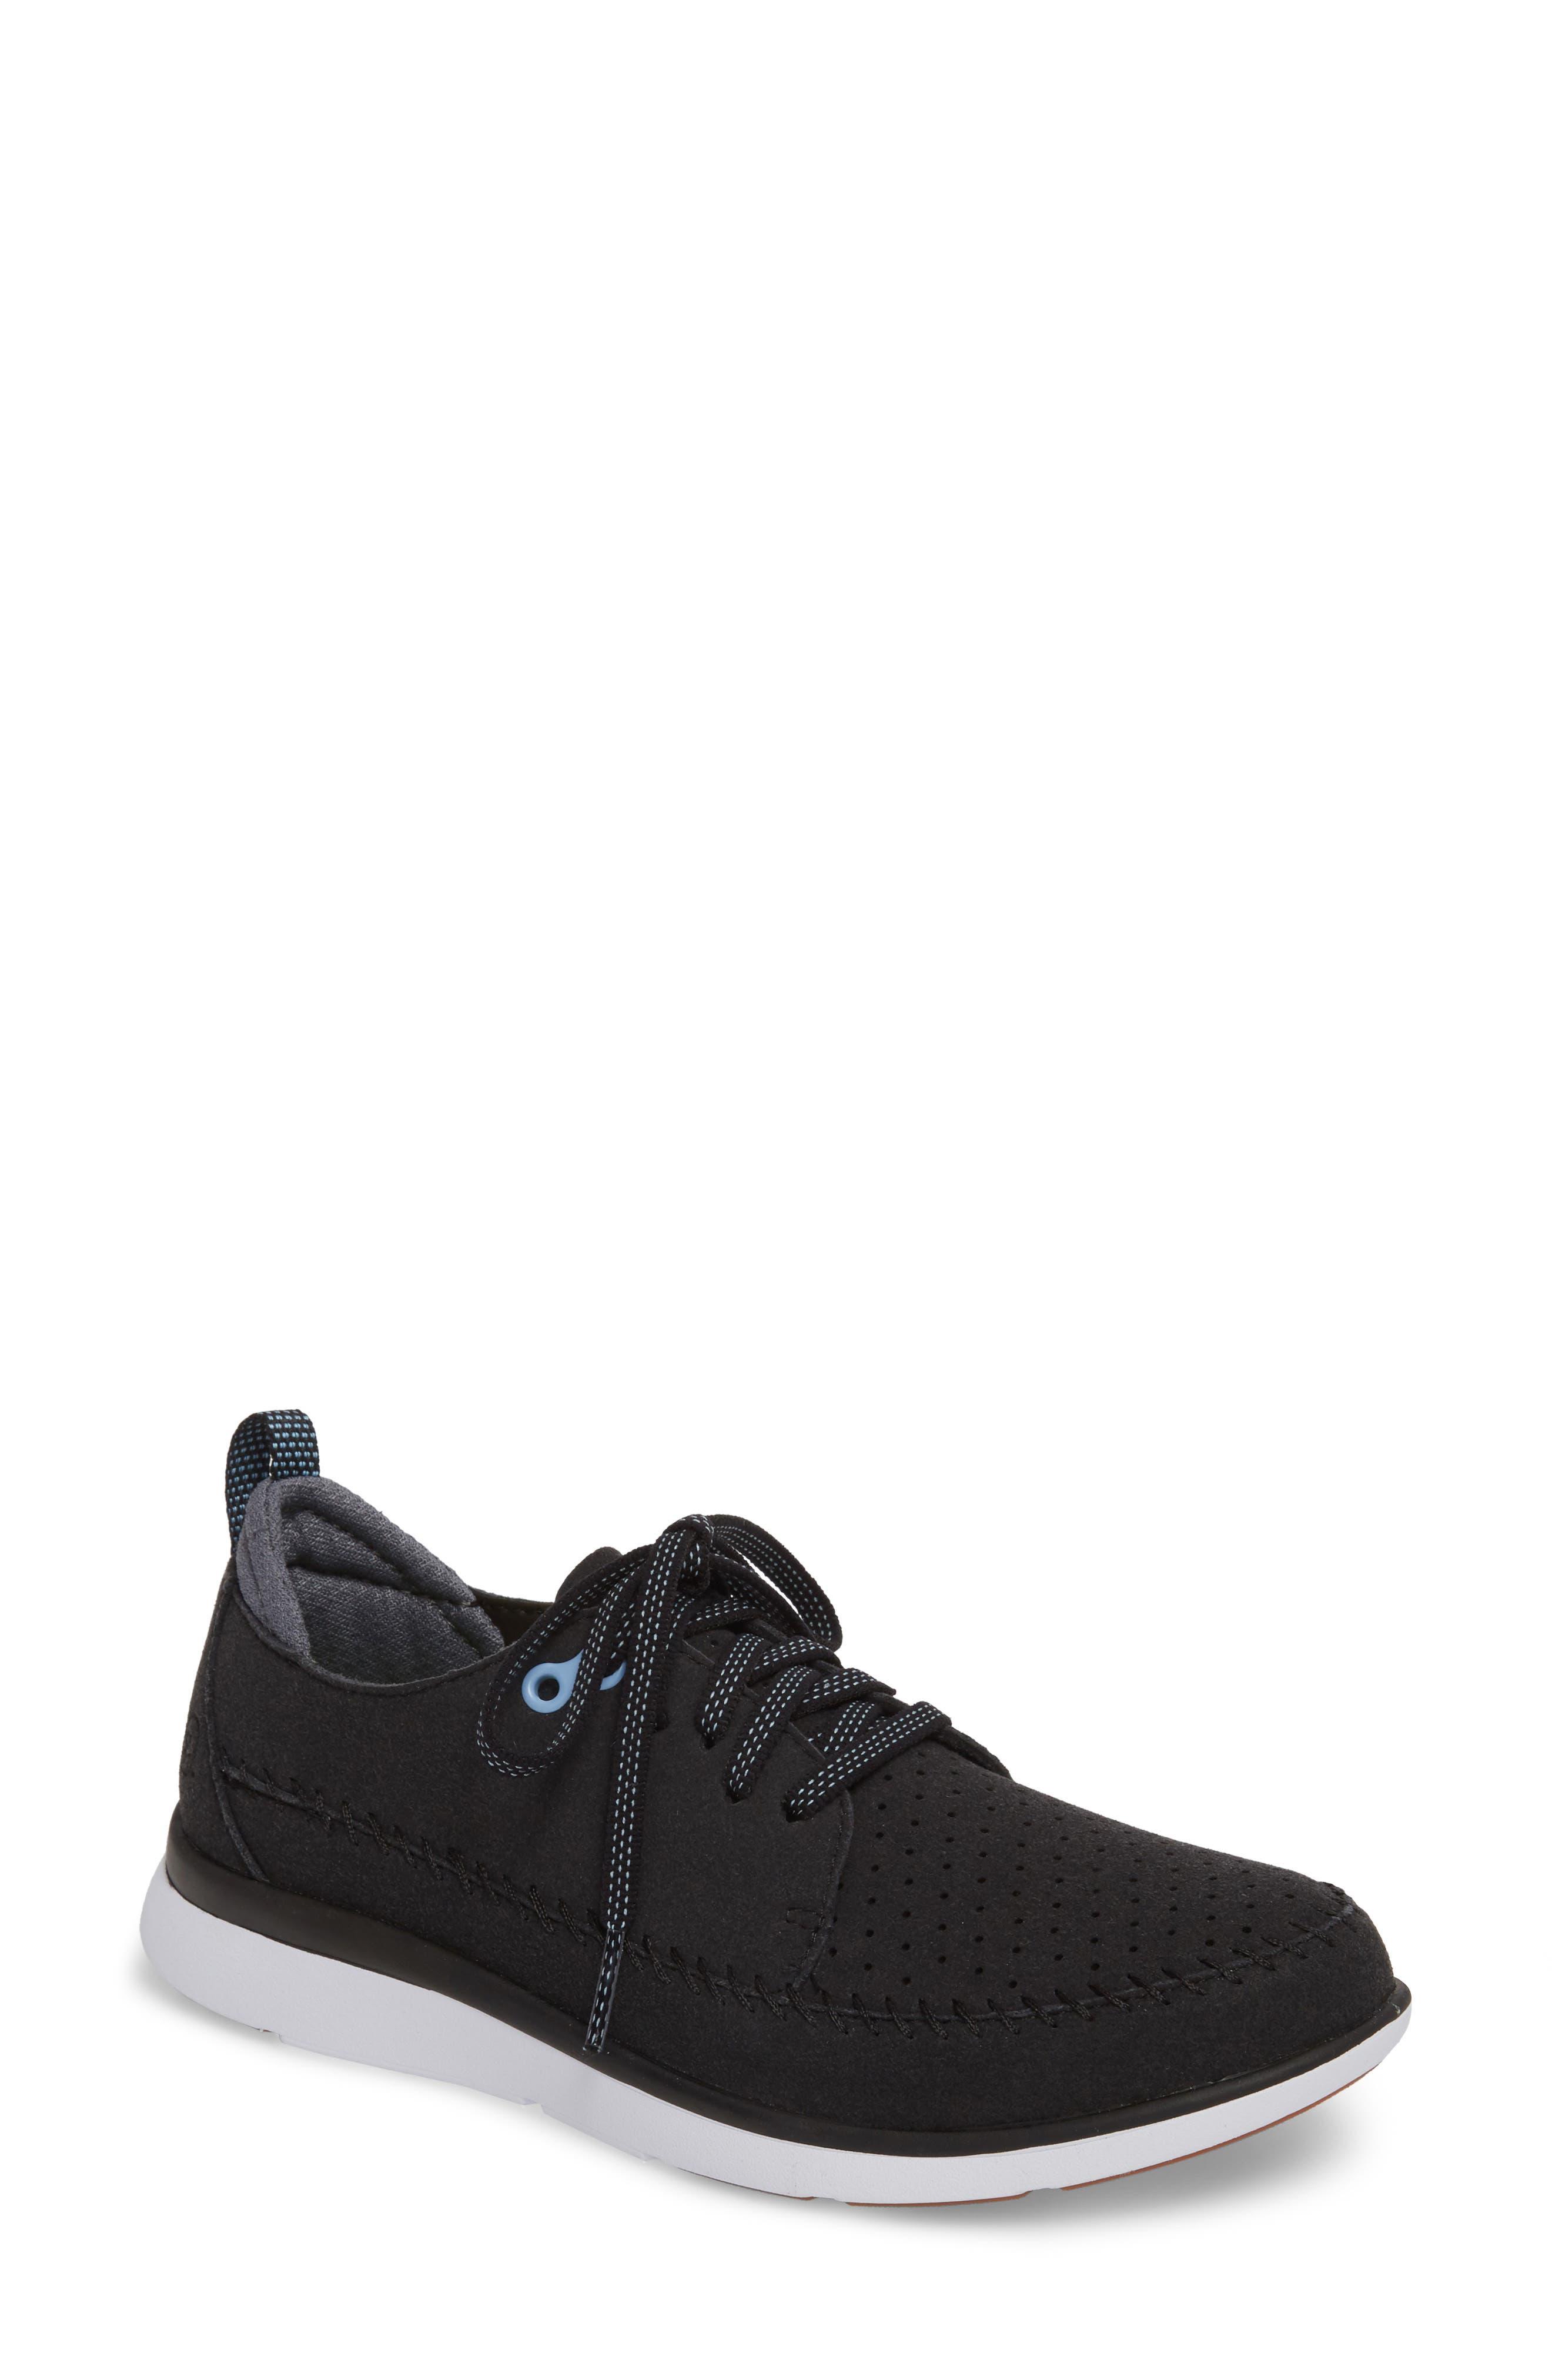 Addy Sneaker,                         Main,                         color, BLACK FABRIC